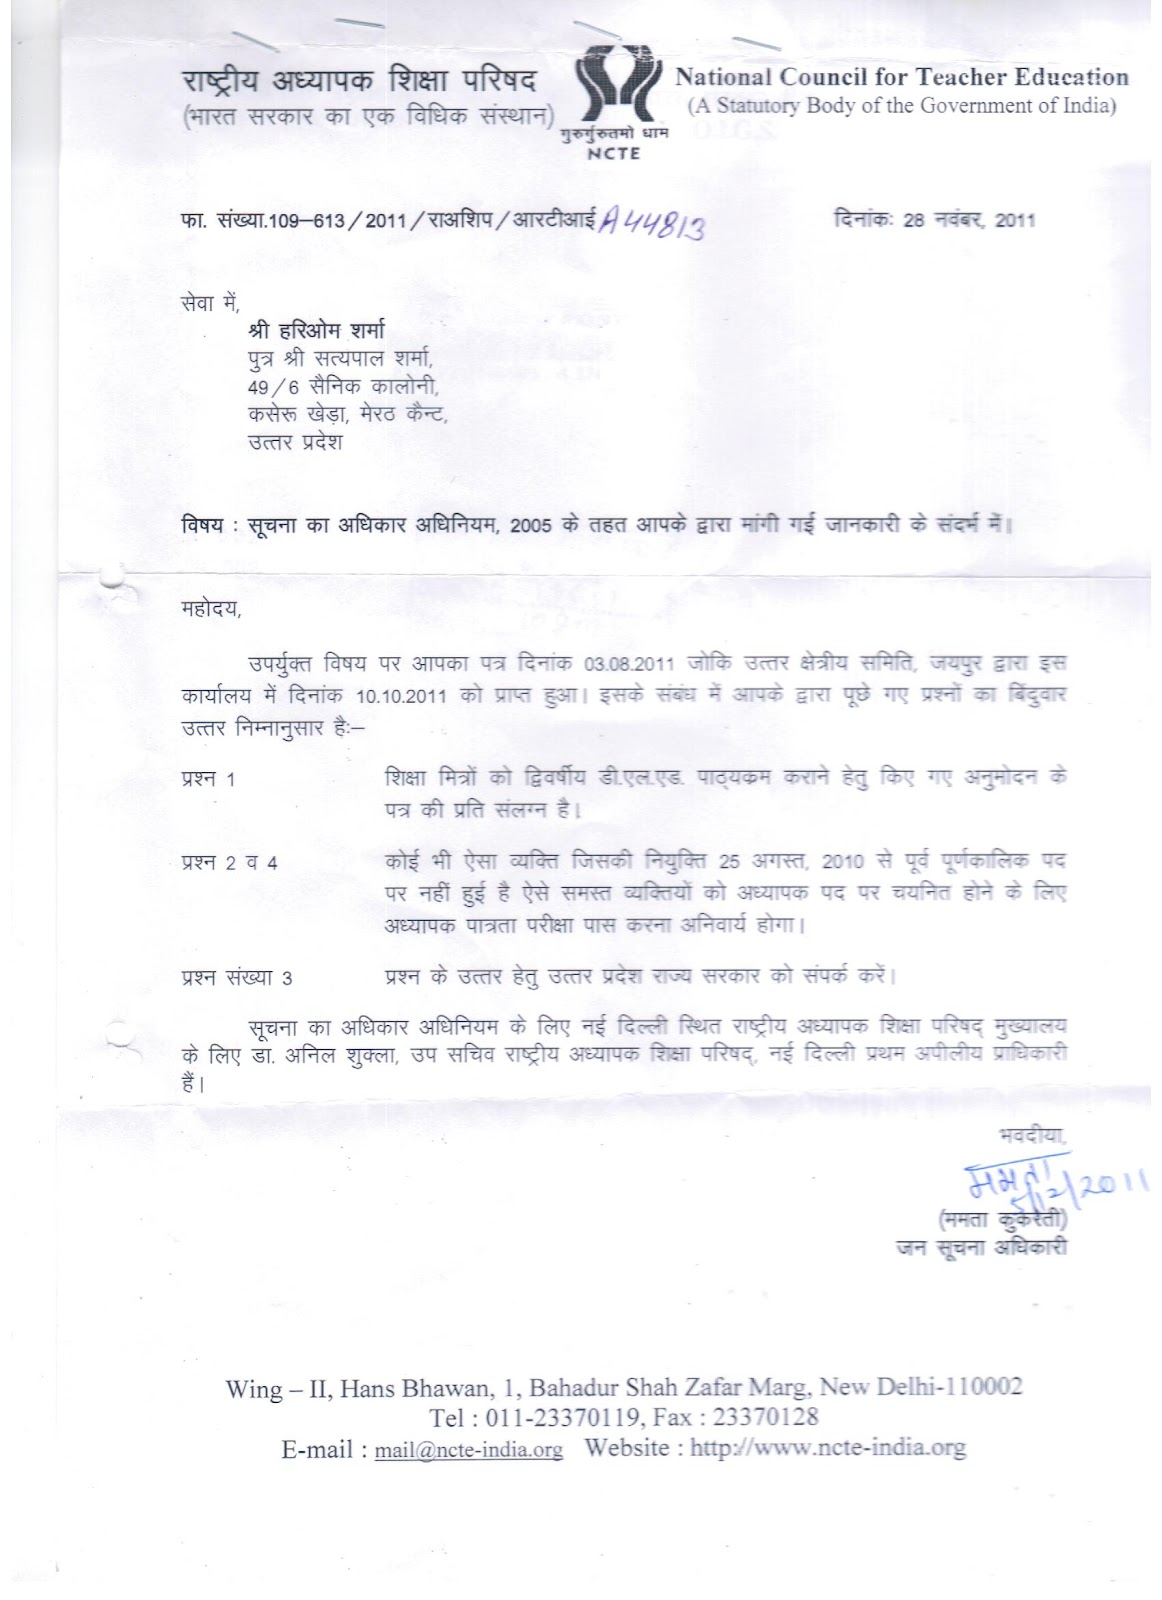 Sarkari naukri recruitment result tet for Koi 5 anopcharik patra